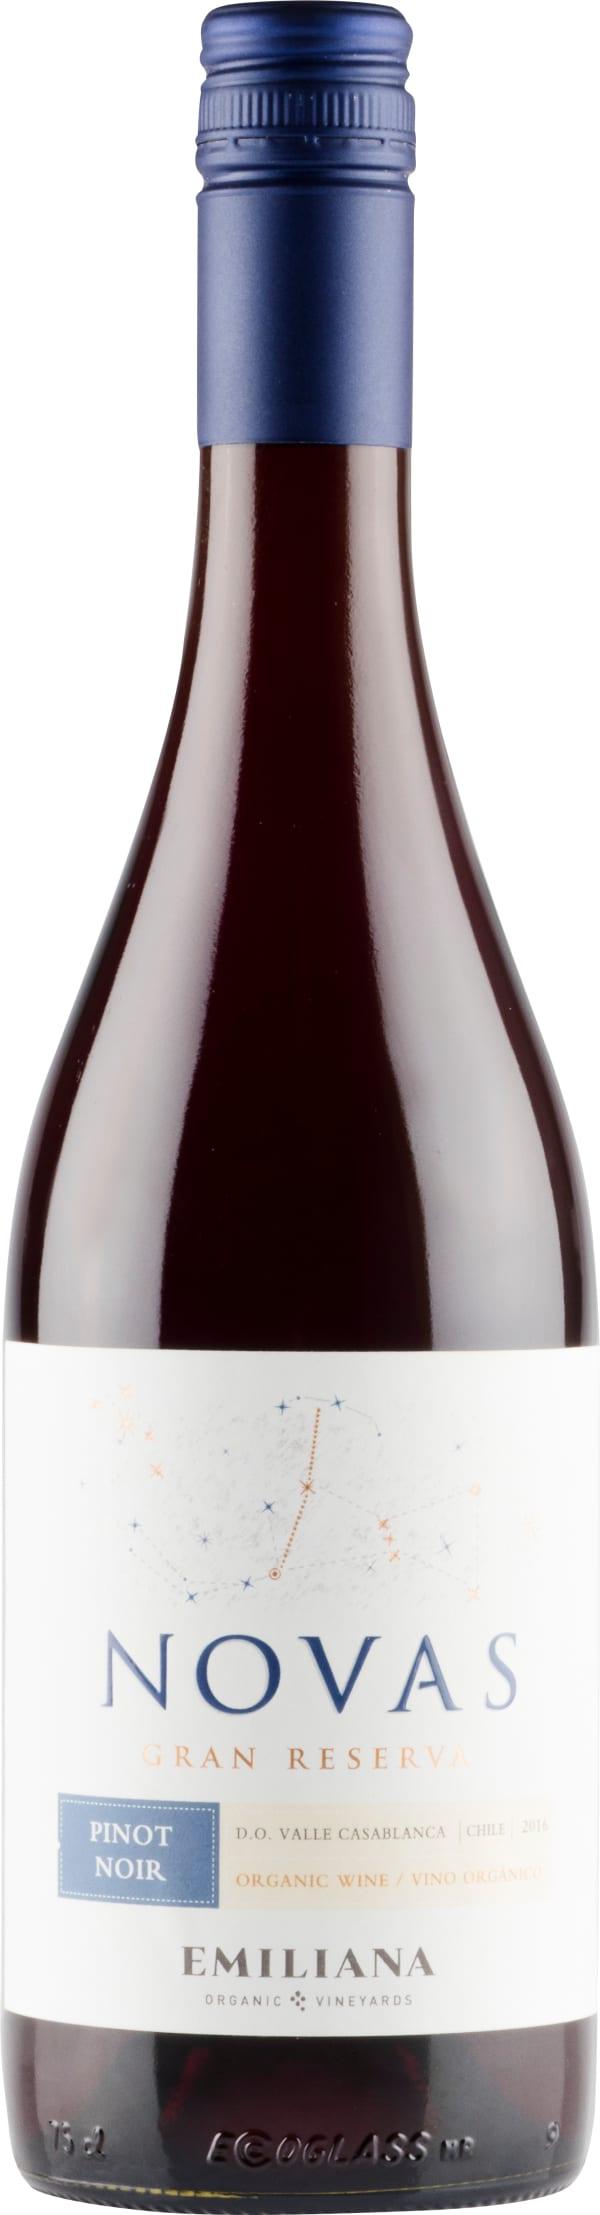 Novas Gran Reserva Pinot Noir 2019